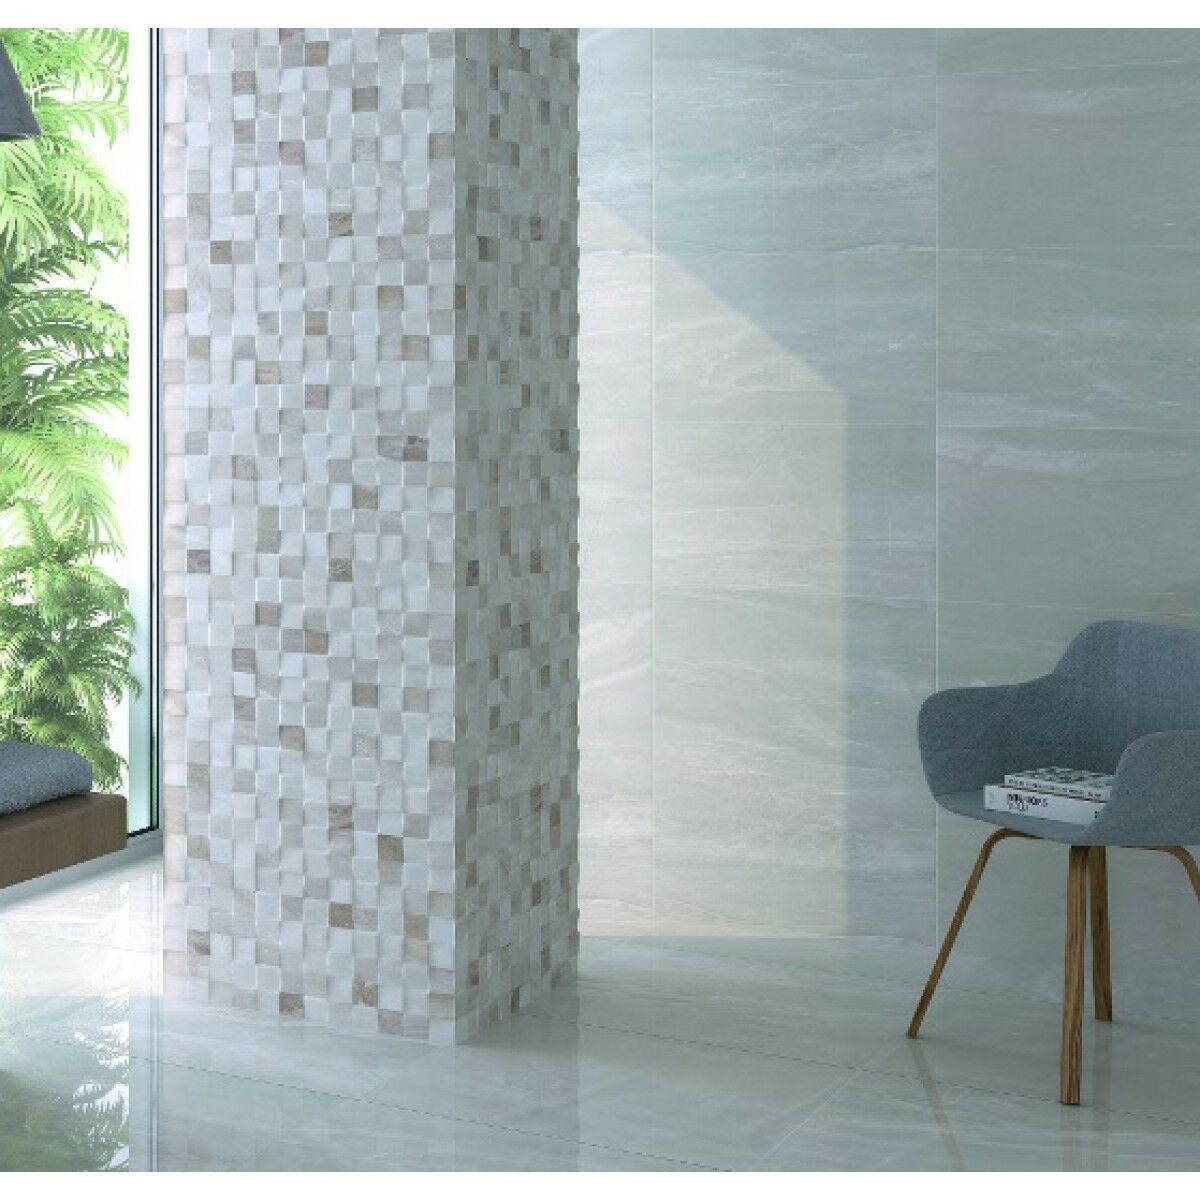 Atrium High Gloss Bathroom Wall Tiles Package Deal 33.3*55 Grey ...